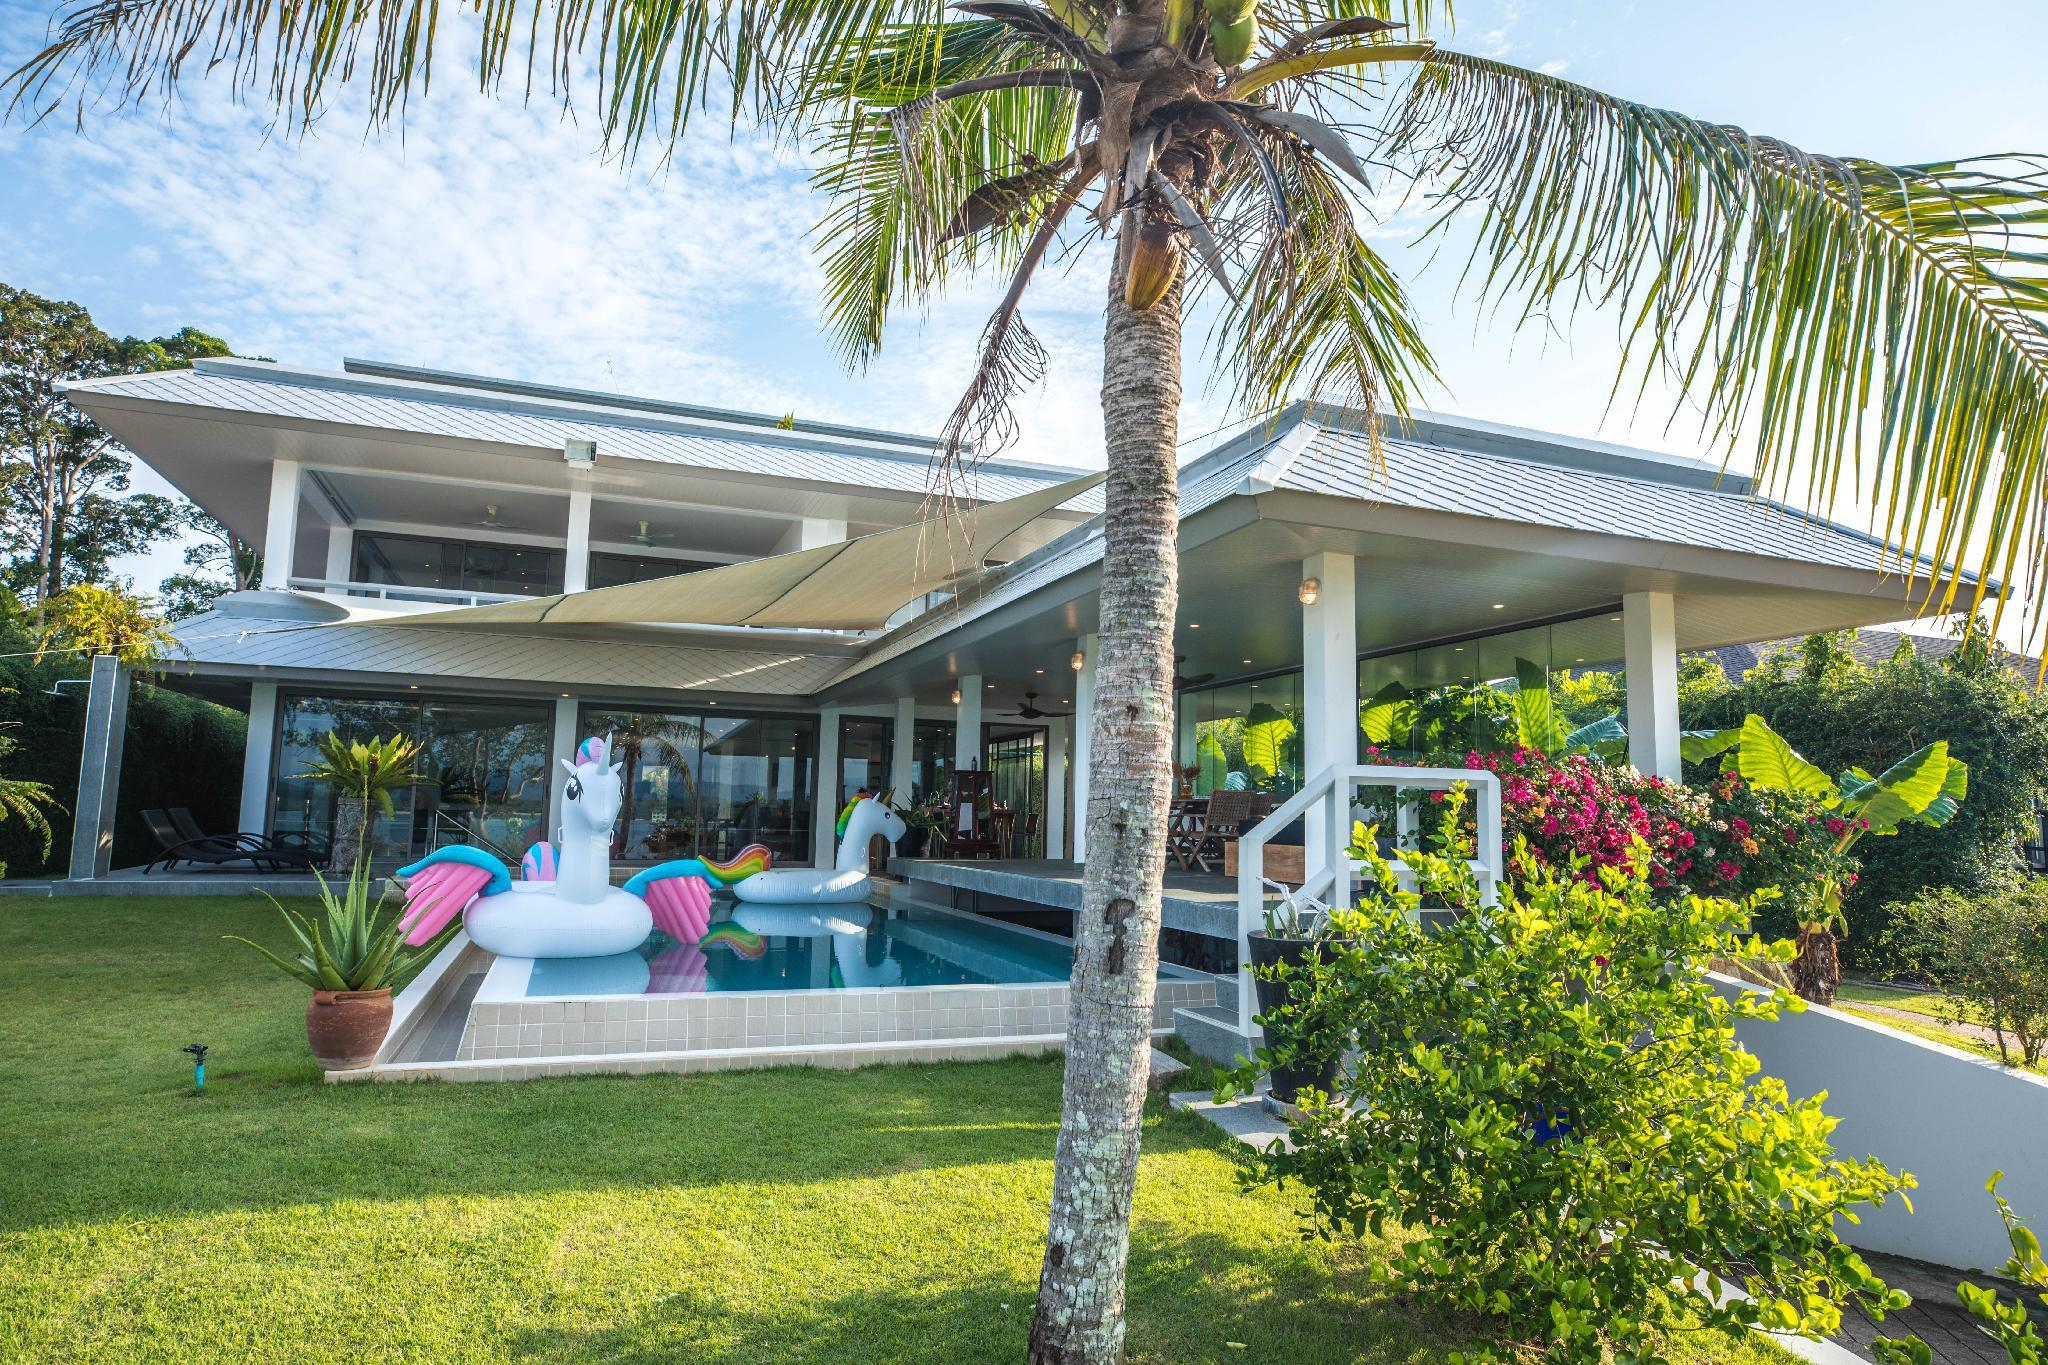 MaiKhao Beach   Private Villa with Two Pools วิลลา 7 ห้องนอน 9 ห้องน้ำส่วนตัว ขนาด 1300 ตร.ม. – ไม้ขาว